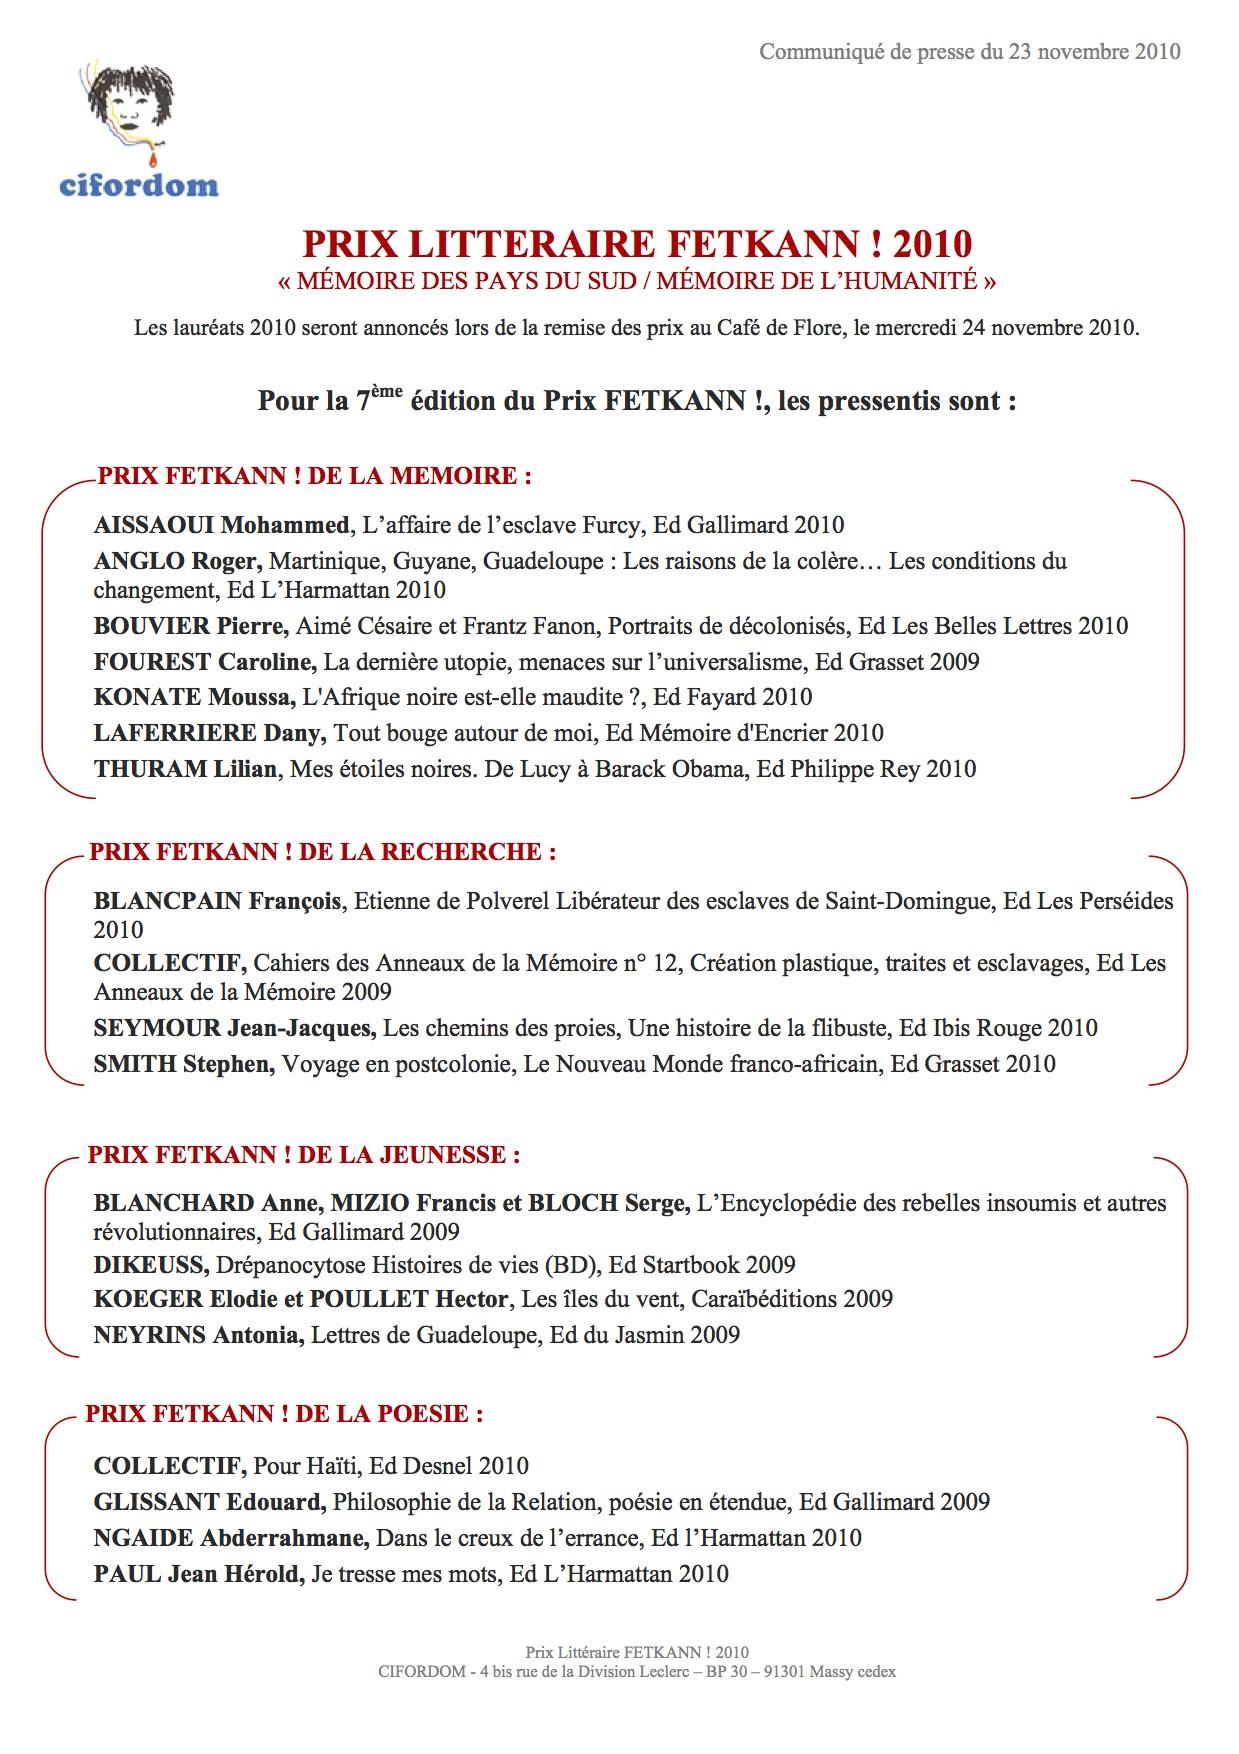 Communique_PRIX_FETKANN_2010_LES_PRESSENTIS-1